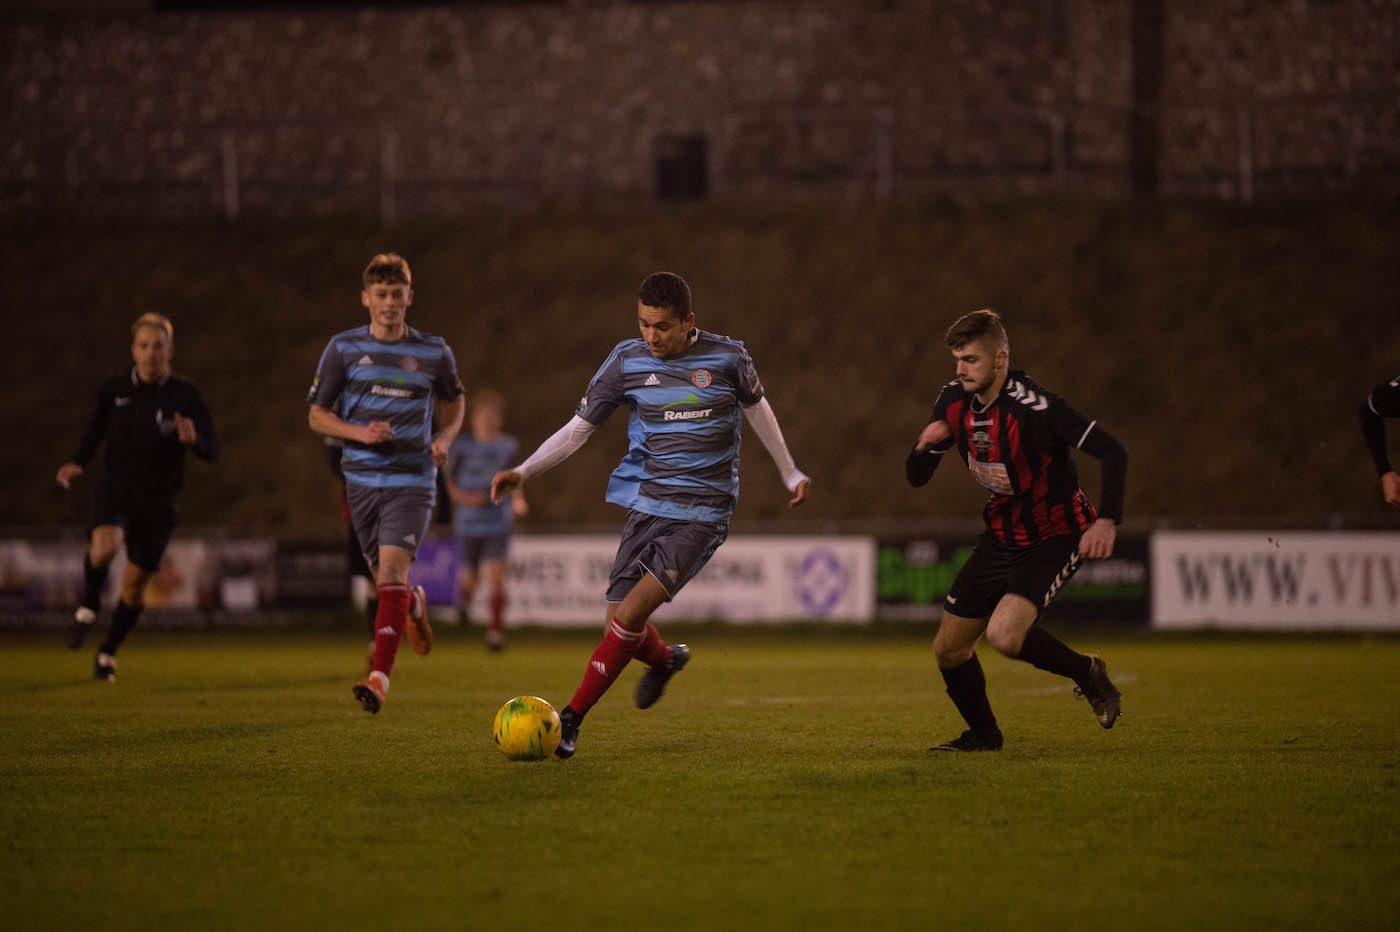 Read the full article - HIGHLIGHTS: Lewes U18 5-0 Worthing U18  [A] – League